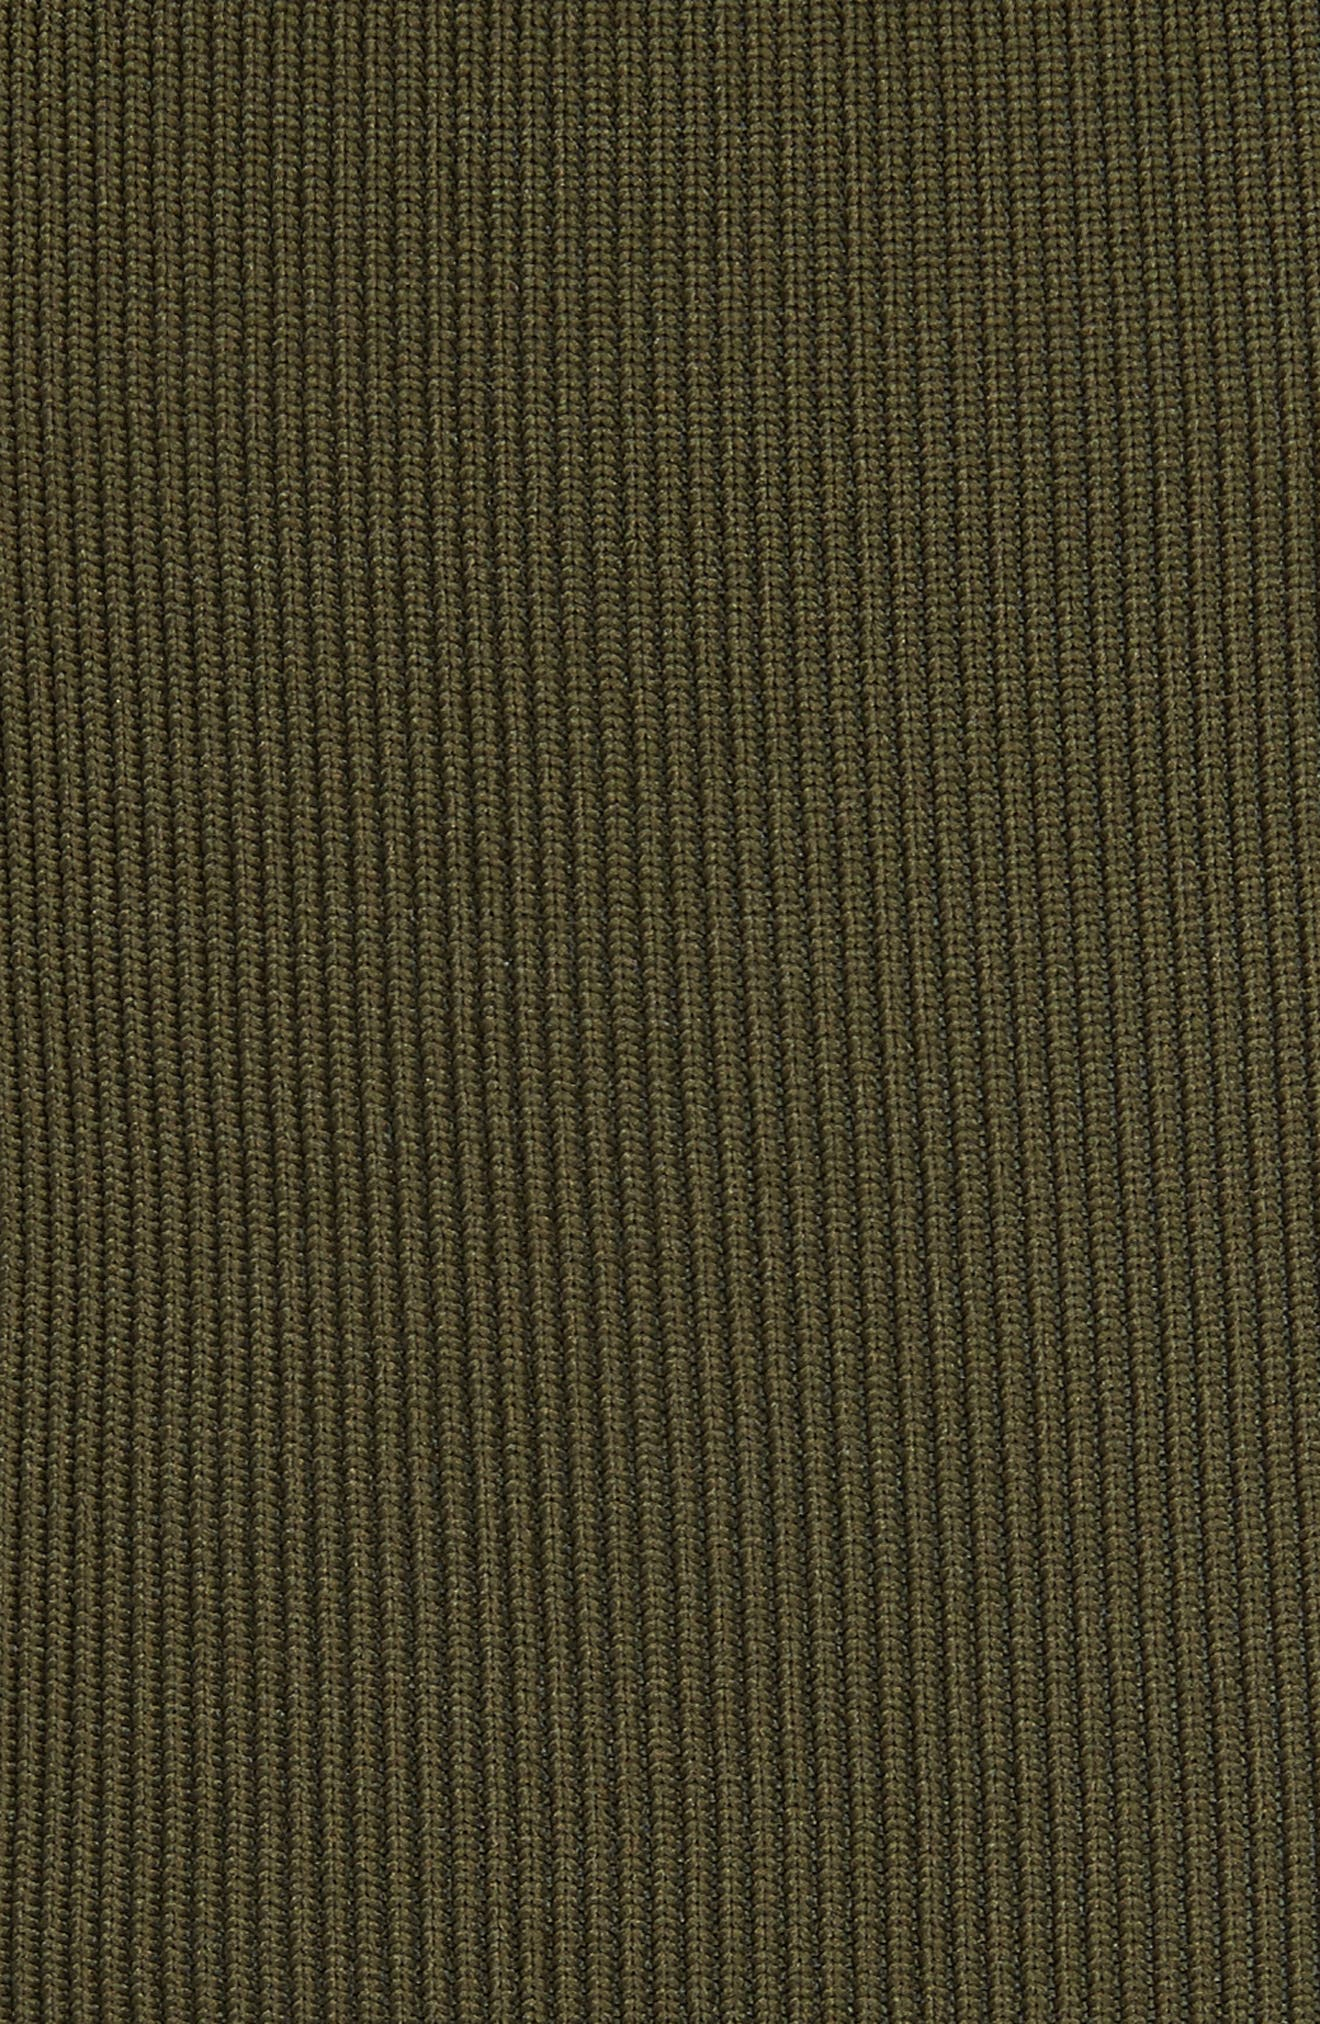 Lace-Up Knit Corset,                             Alternate thumbnail 5, color,                             Loden